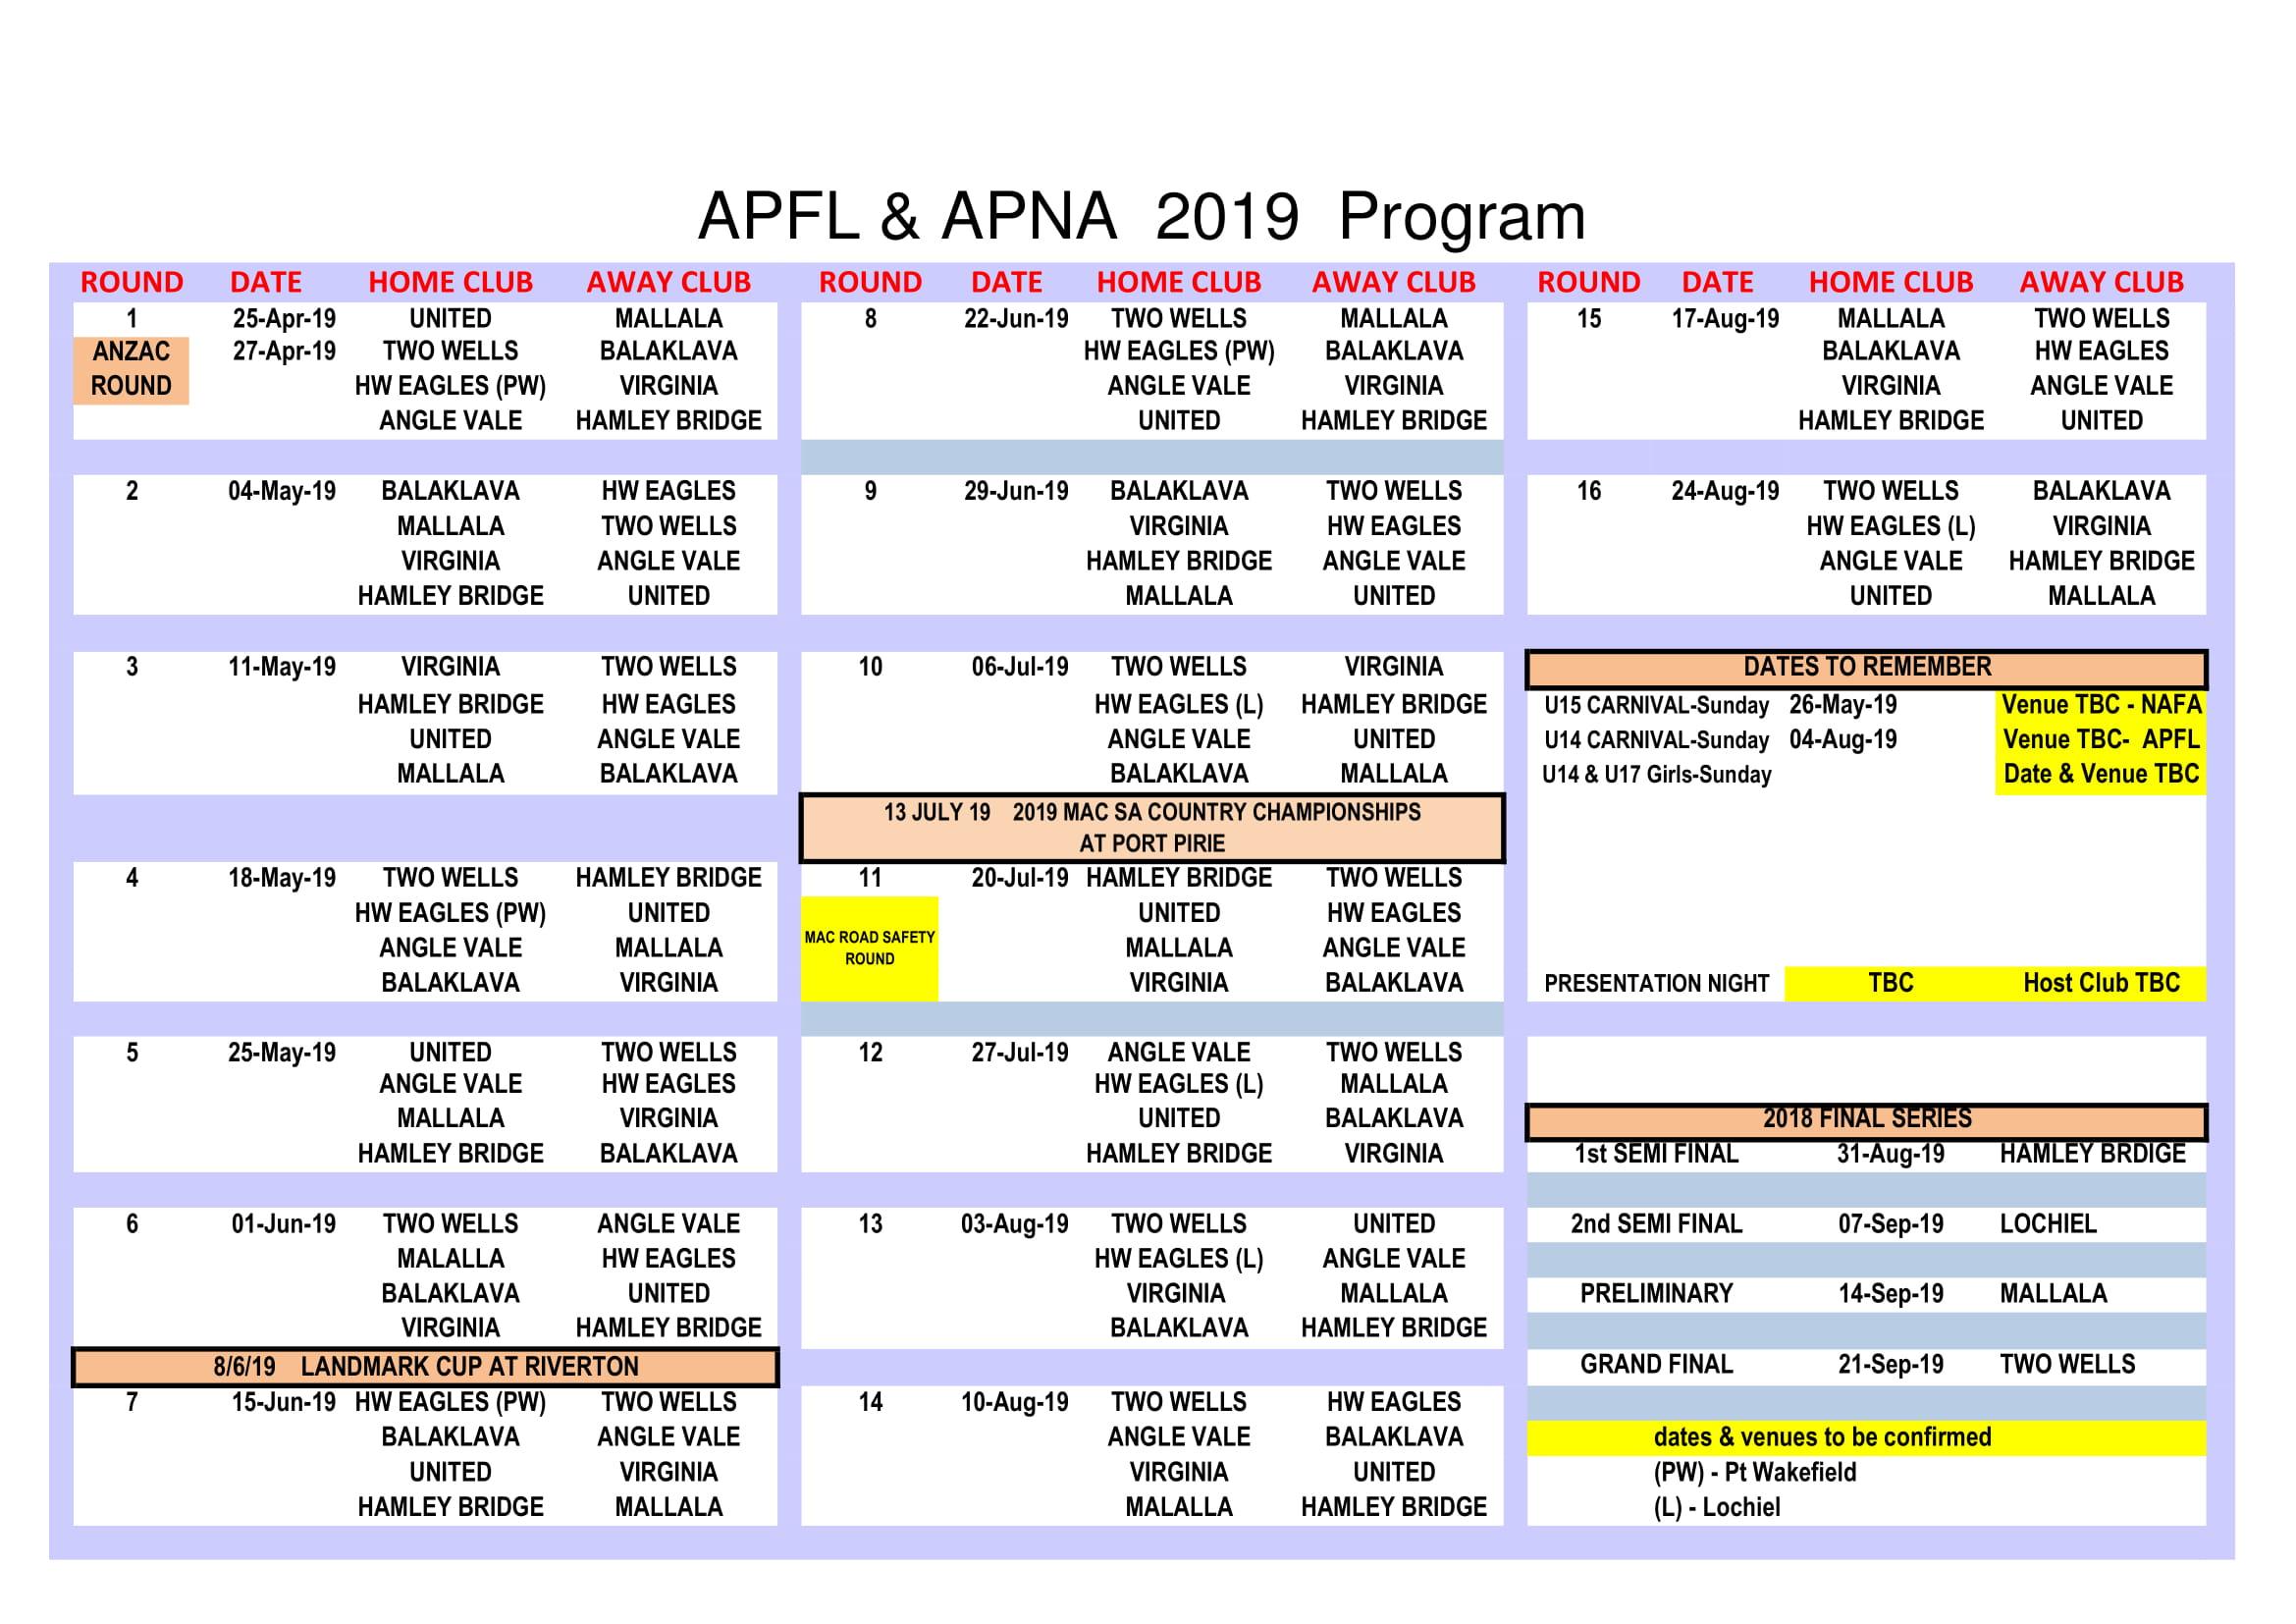 APFL APNA Program 2019-1.jpg